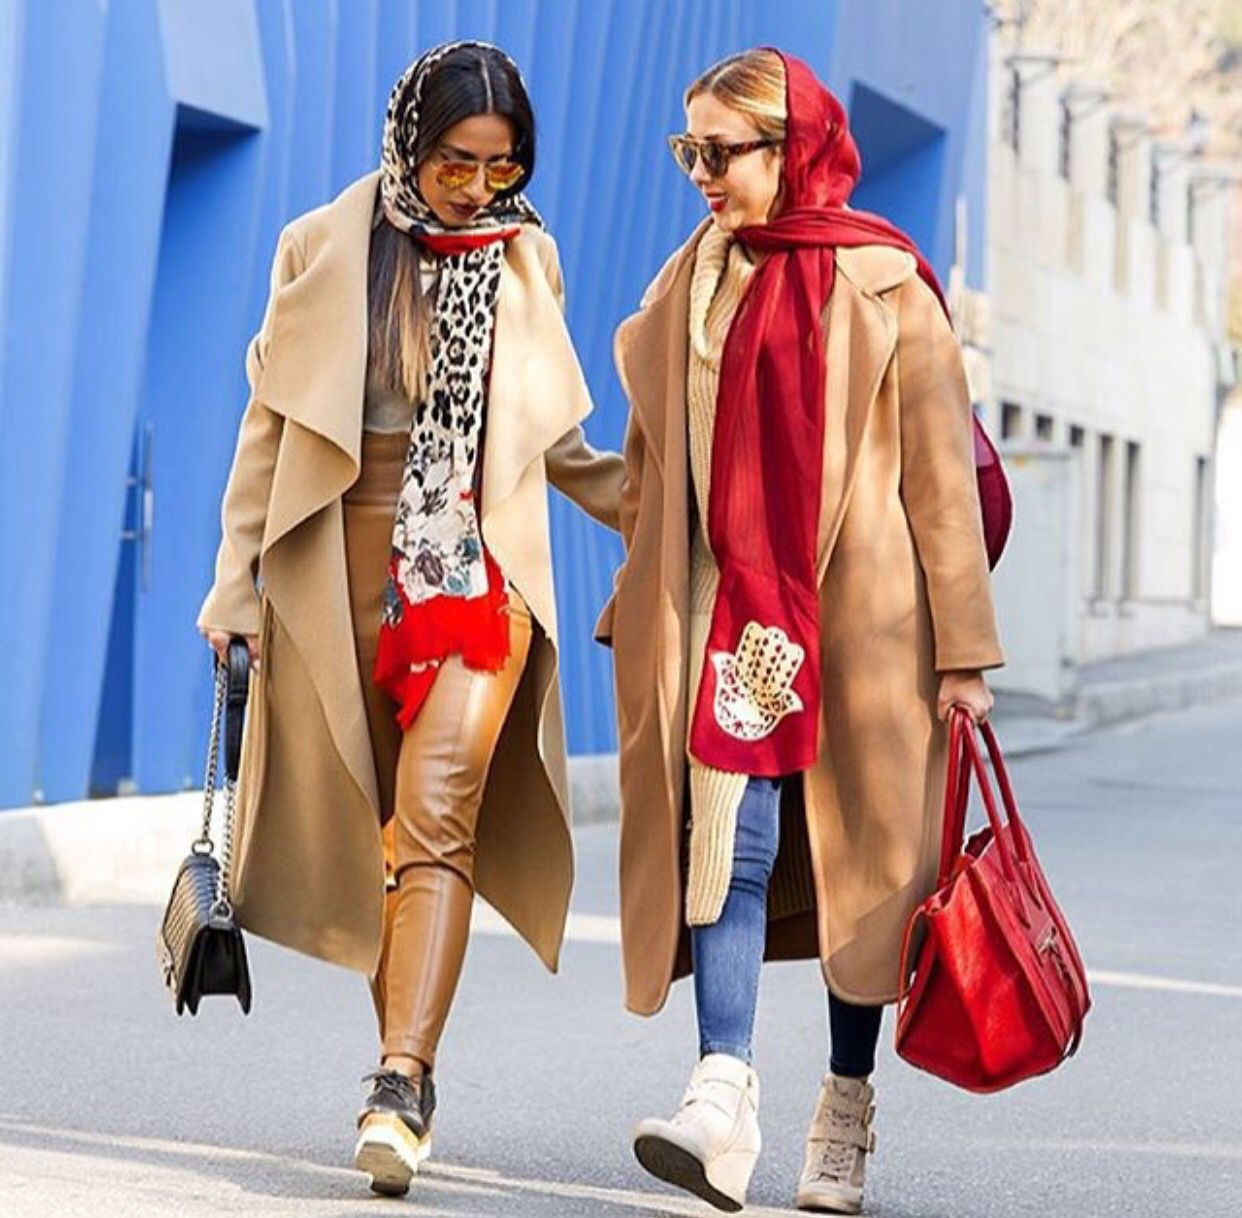 Iranian women welcome the new fashion | IRAN This Way